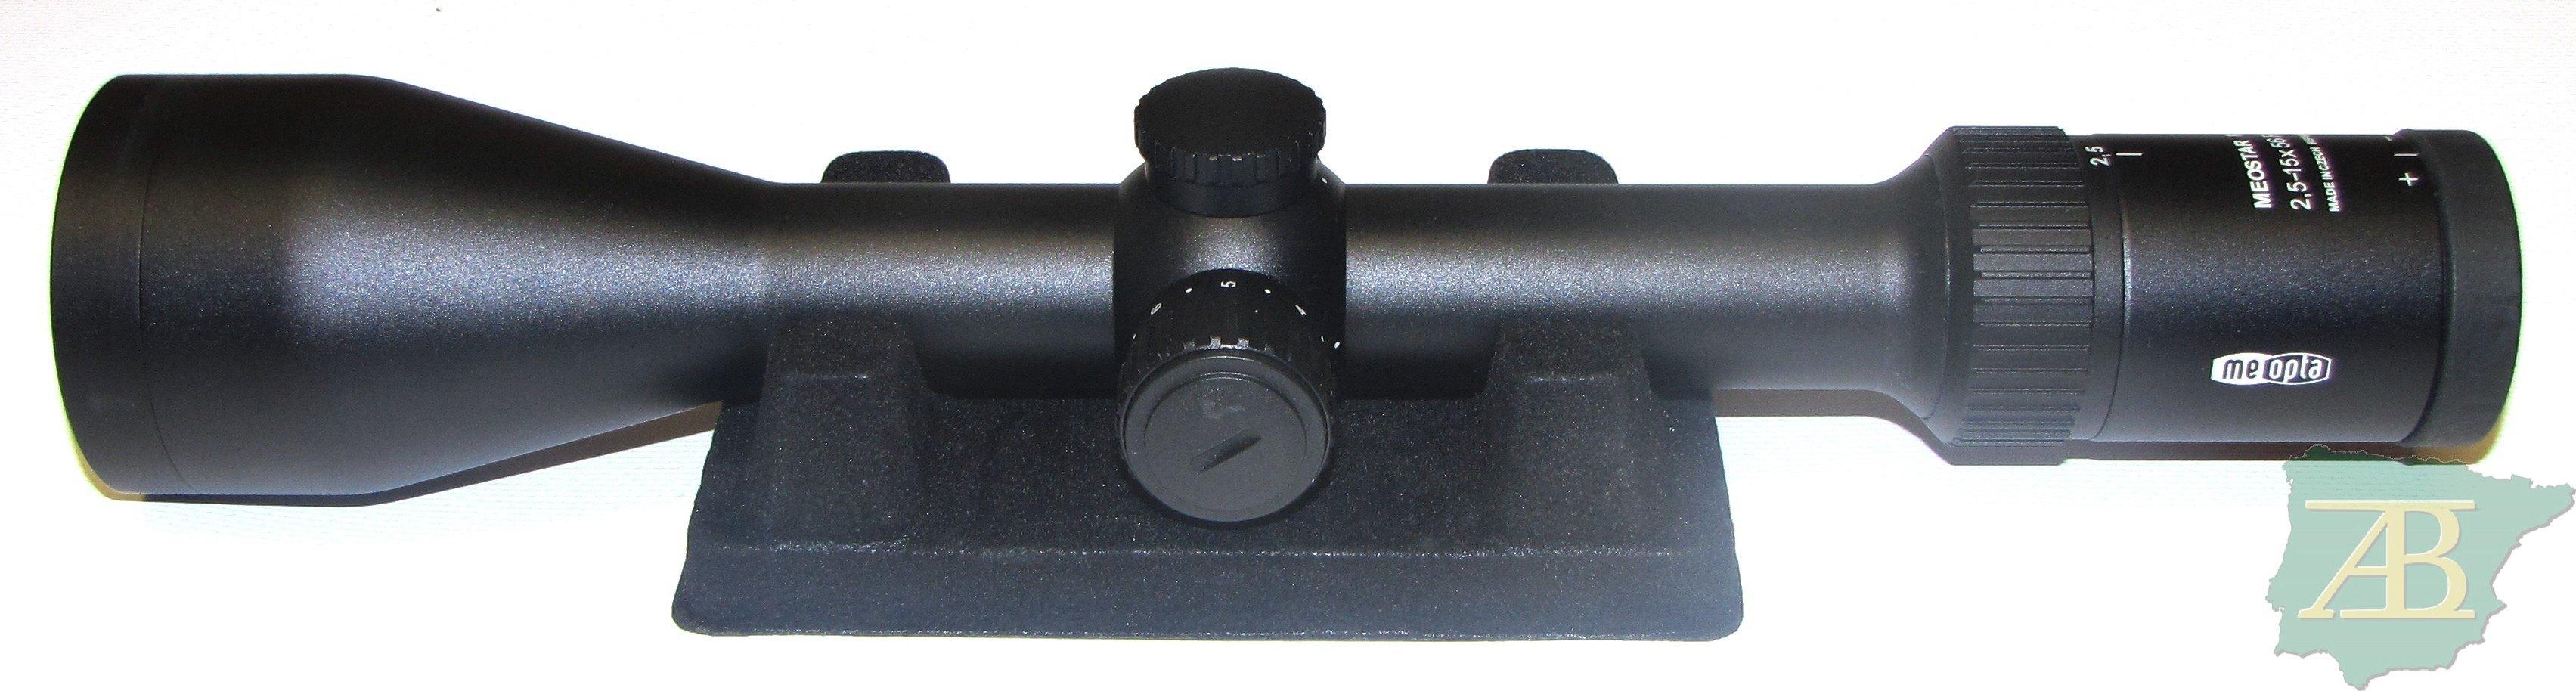 MEOPTA MEOSTAR R2 2.5-15X56 RD